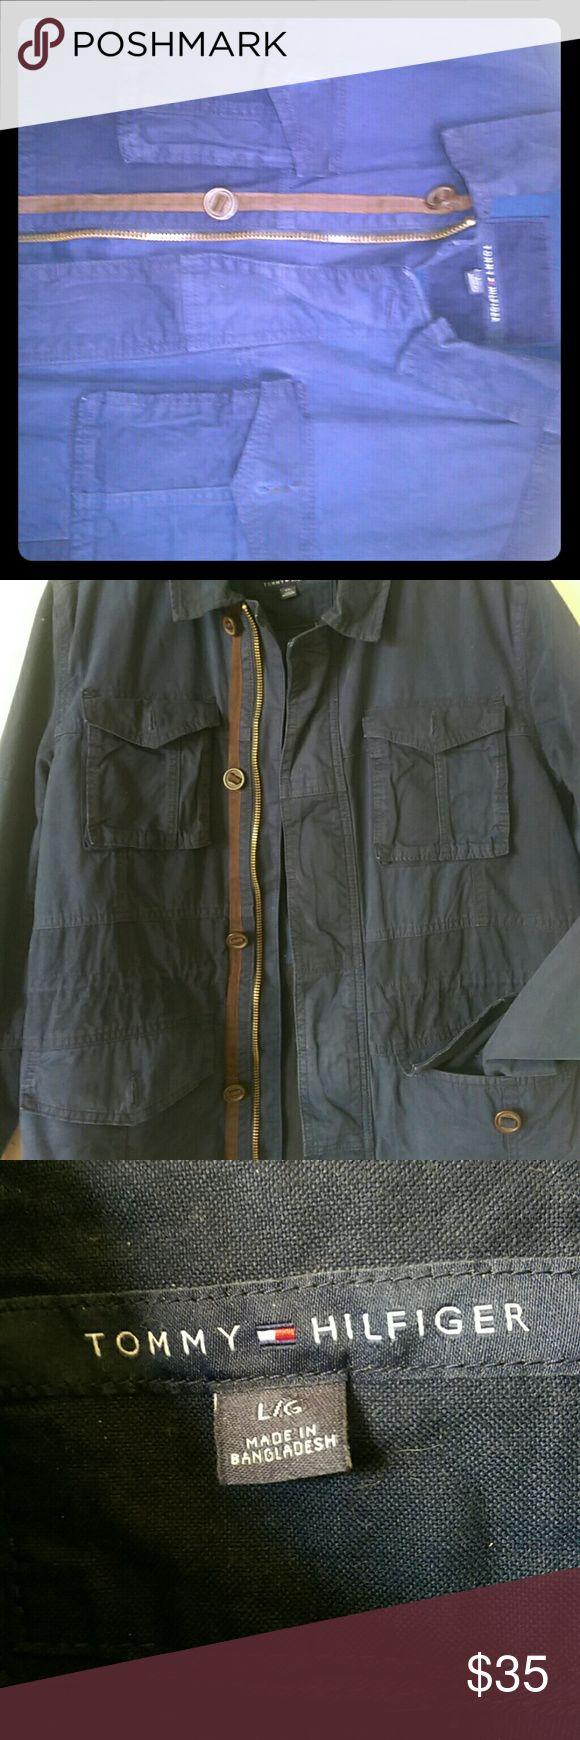 Army Jacket Tommy Hilfiger Army Jacket Tommy Hilfiger Jackets & Coats Military & Field